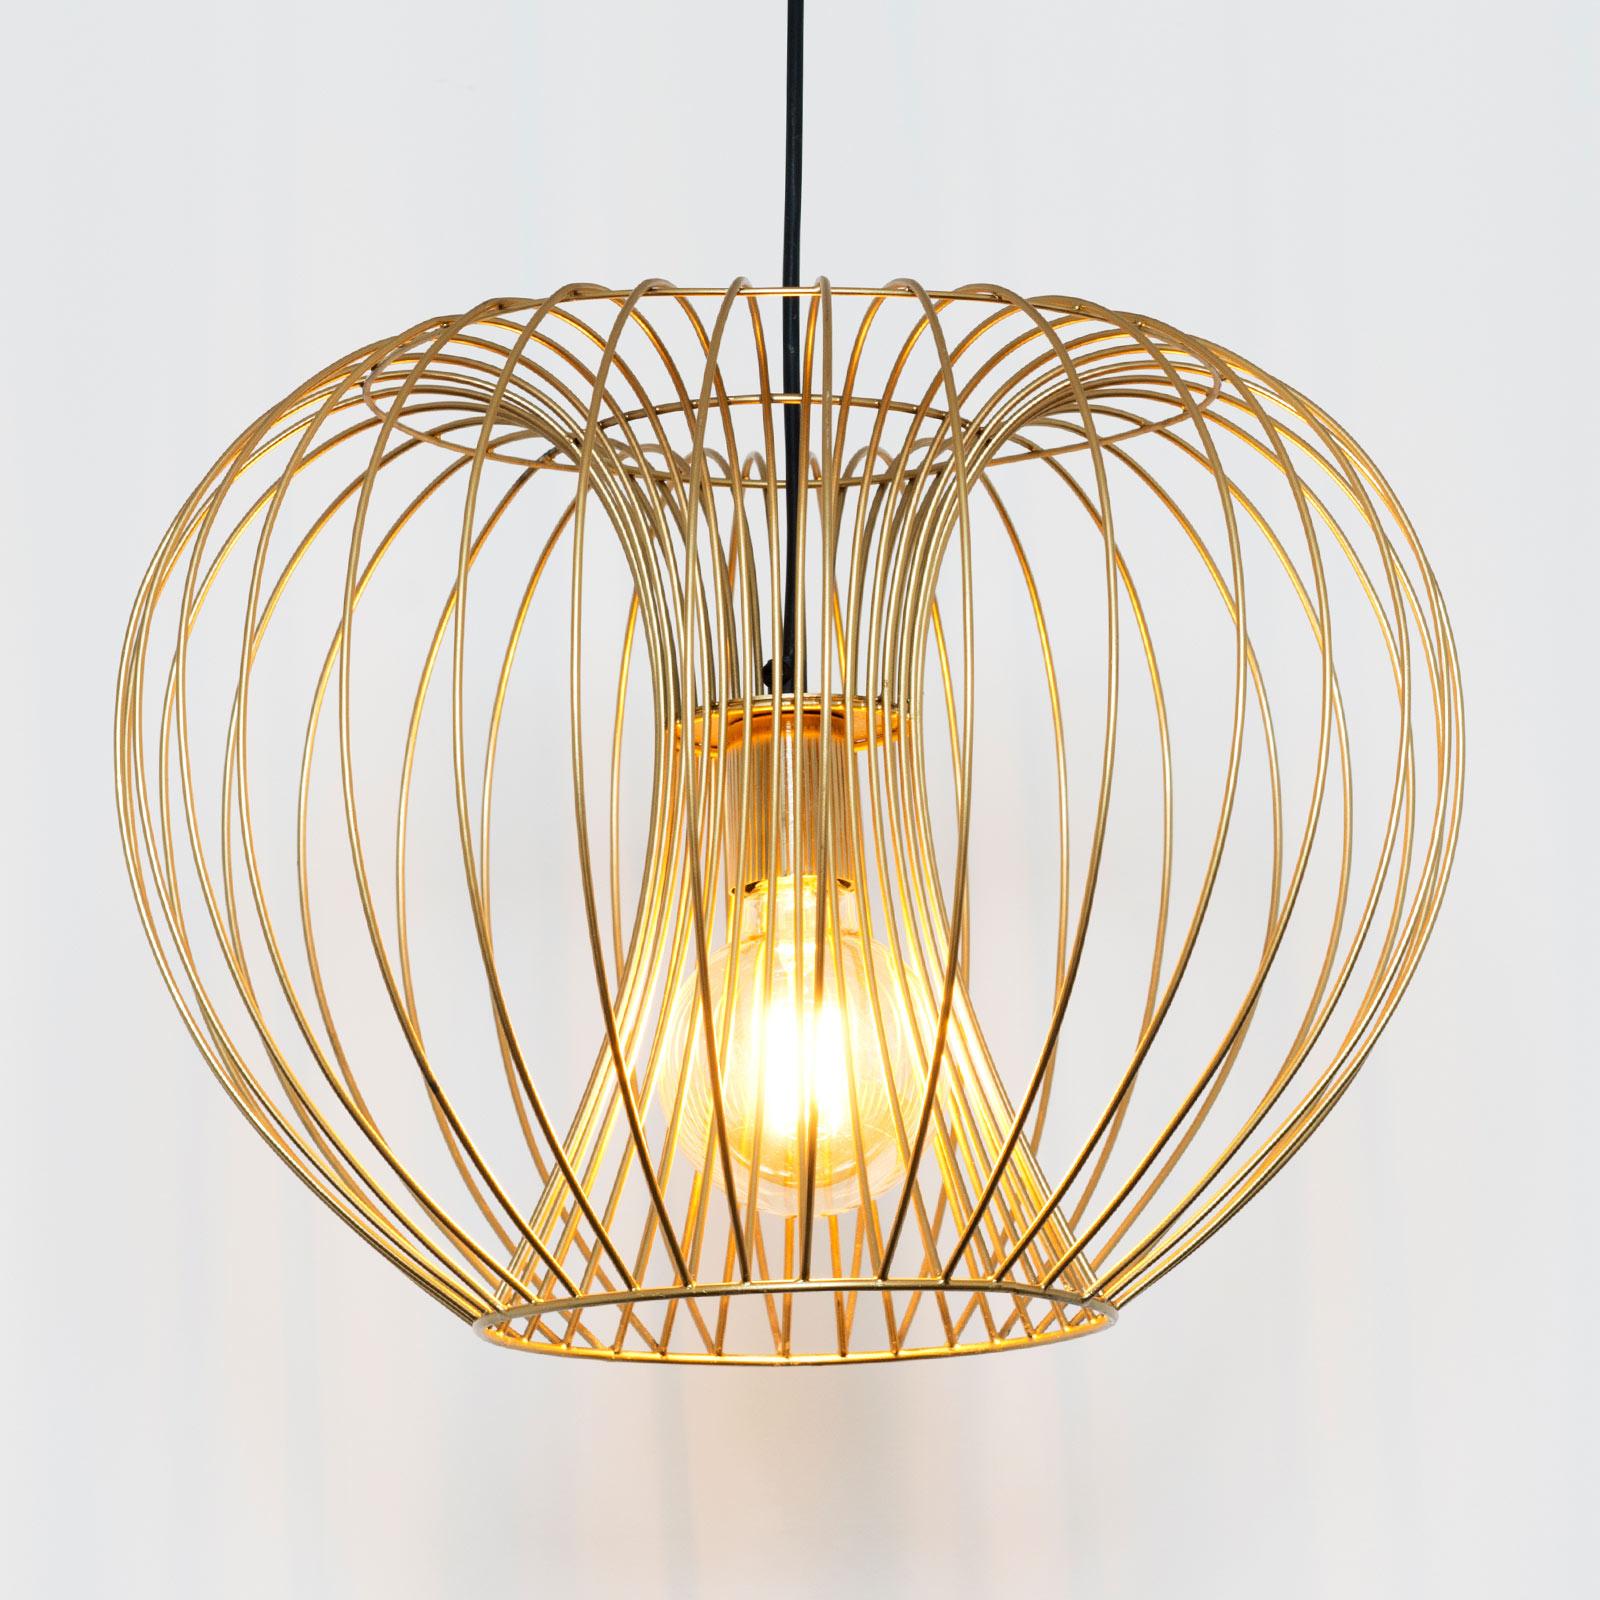 Protetto hængelampe, guld, Ø 42 cm